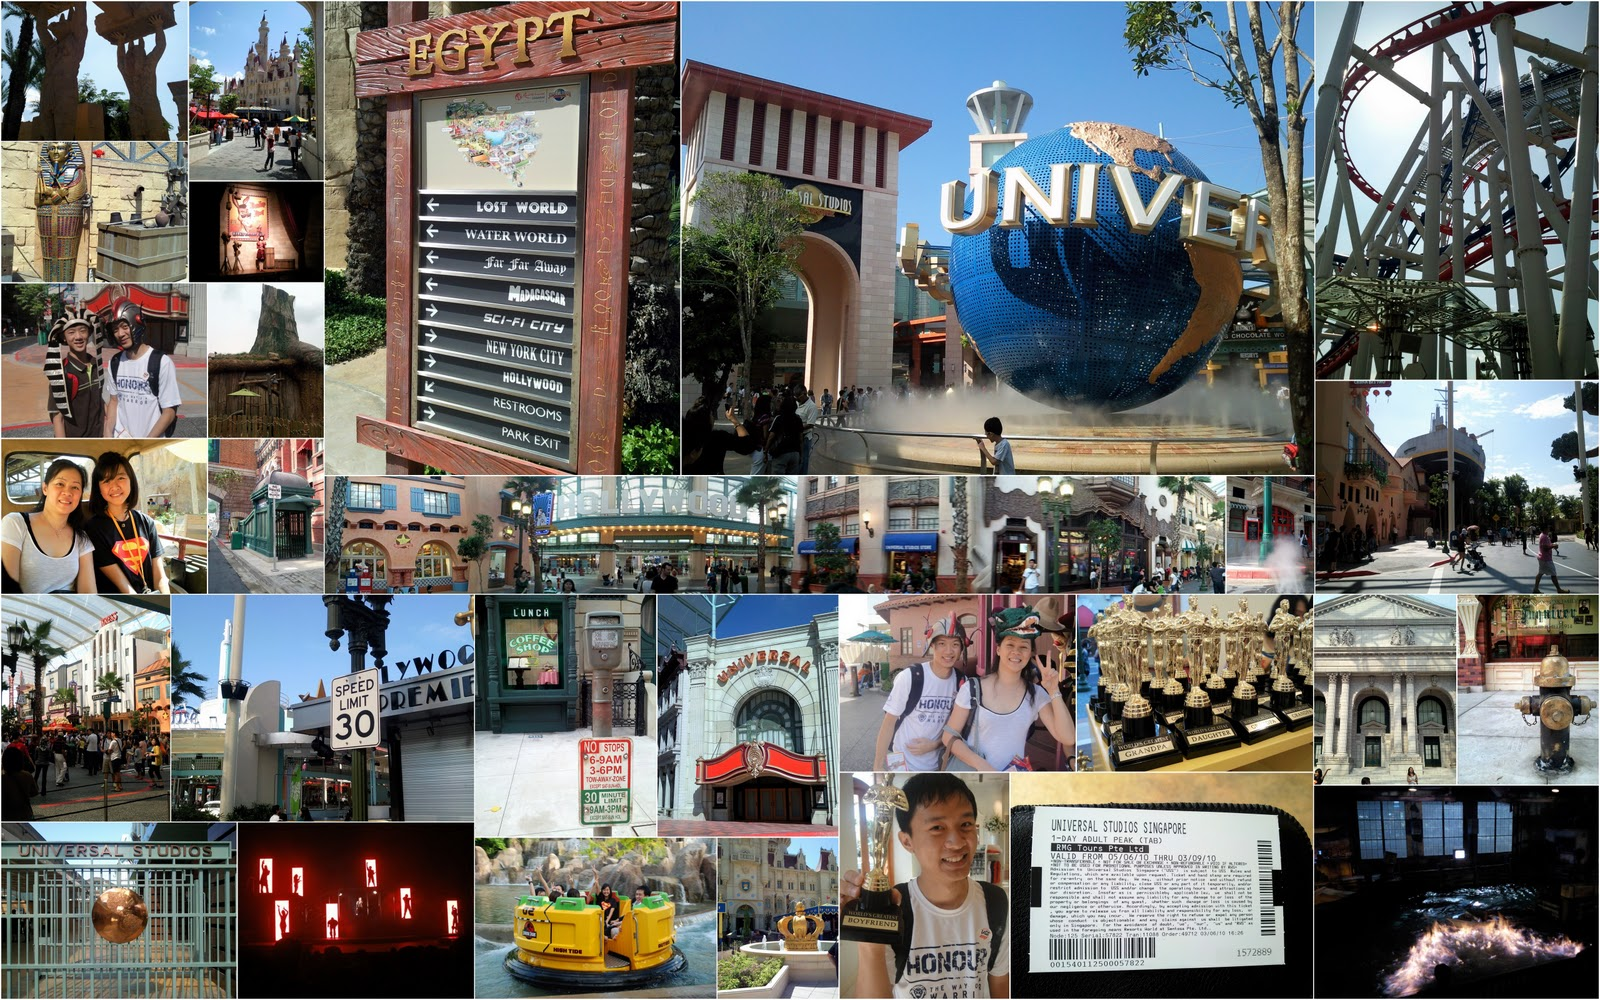 Trip to universal studios essay